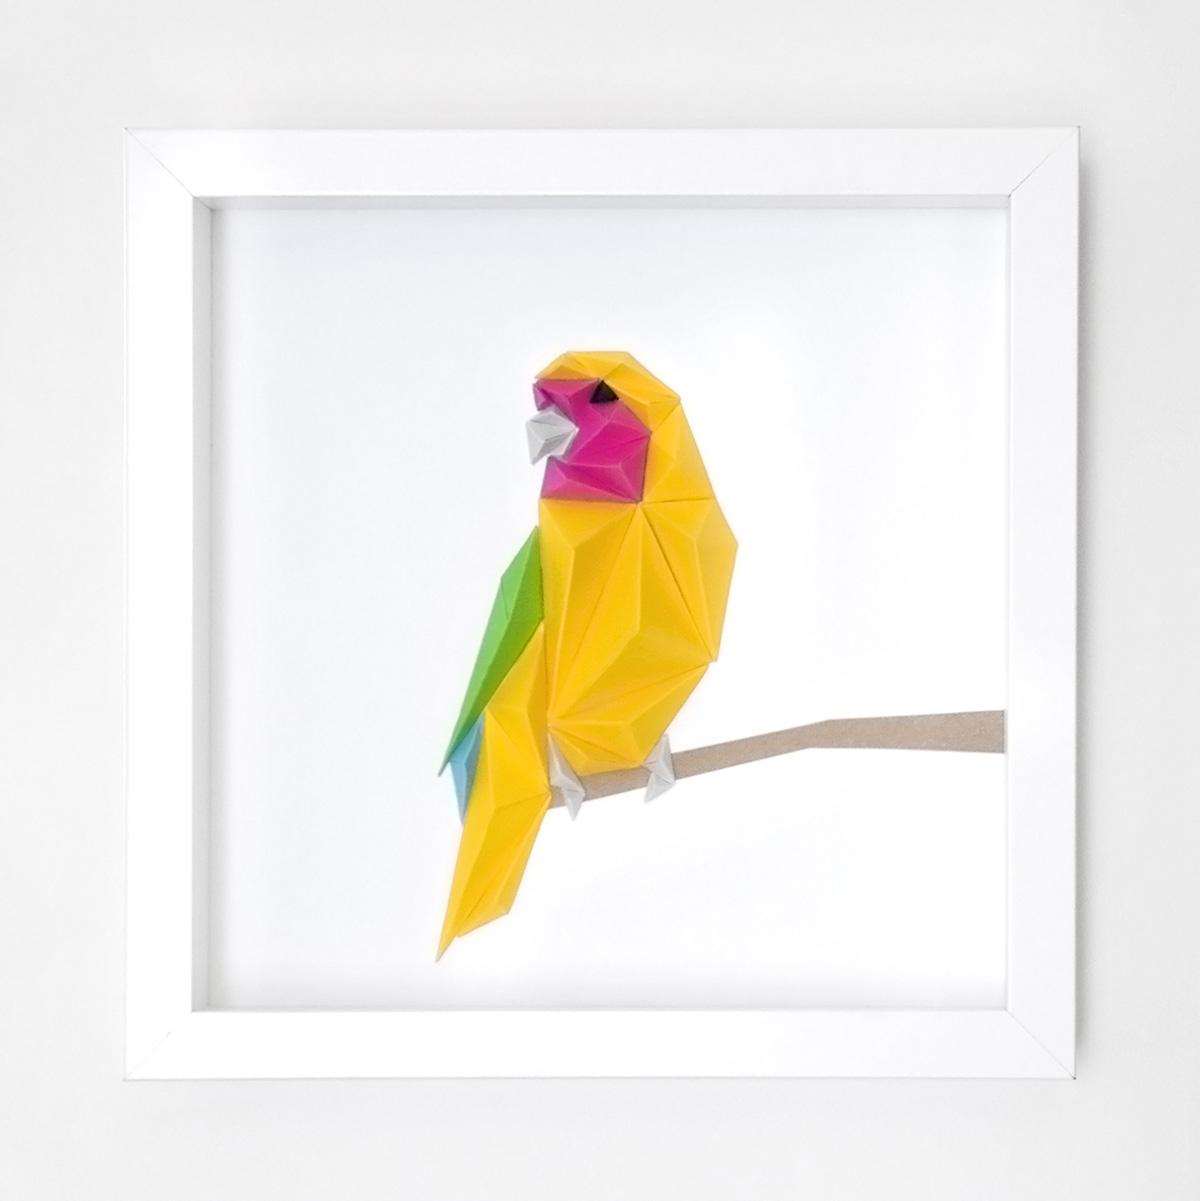 Birds Series Alta Papercraft Parrot Origamiorigami Macaw Parrotorigami Diagram Altapapercraft Squareframe Priscilla